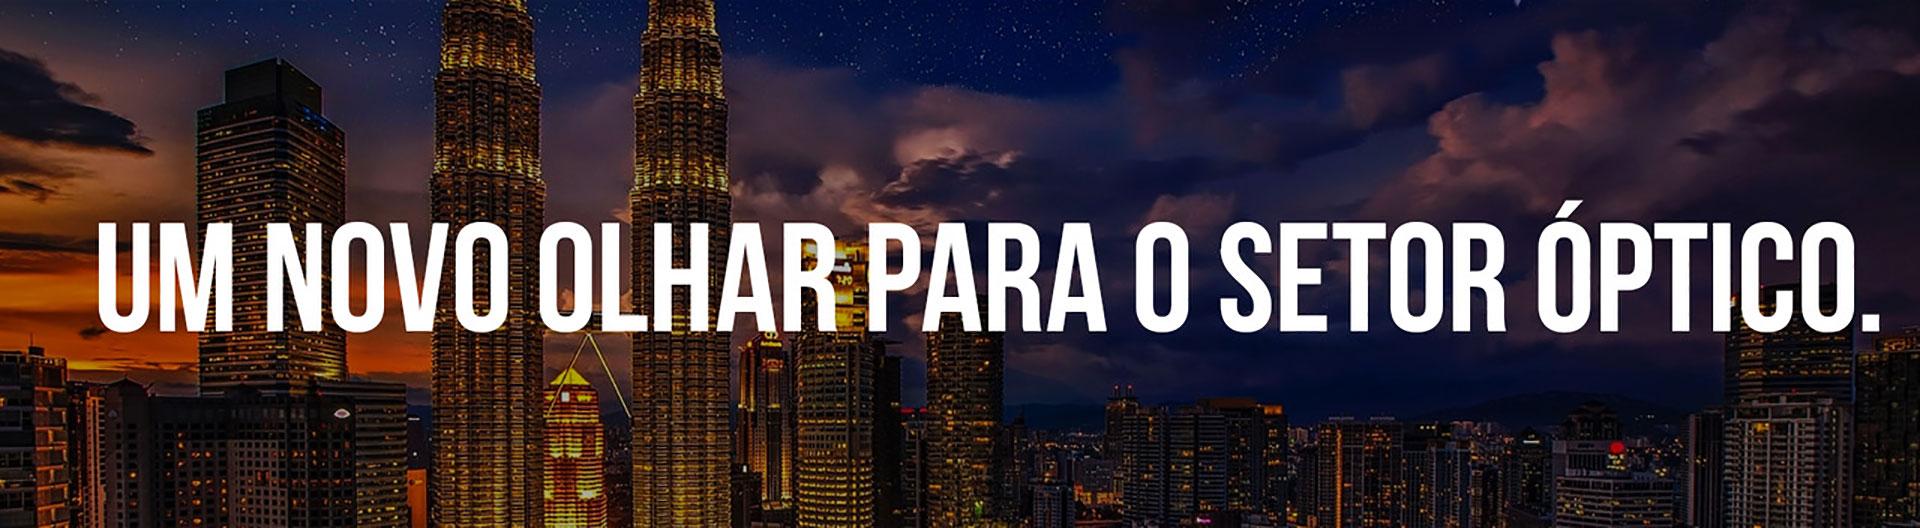 4290d6a96 Informações – Expo Óptica Brasil Open